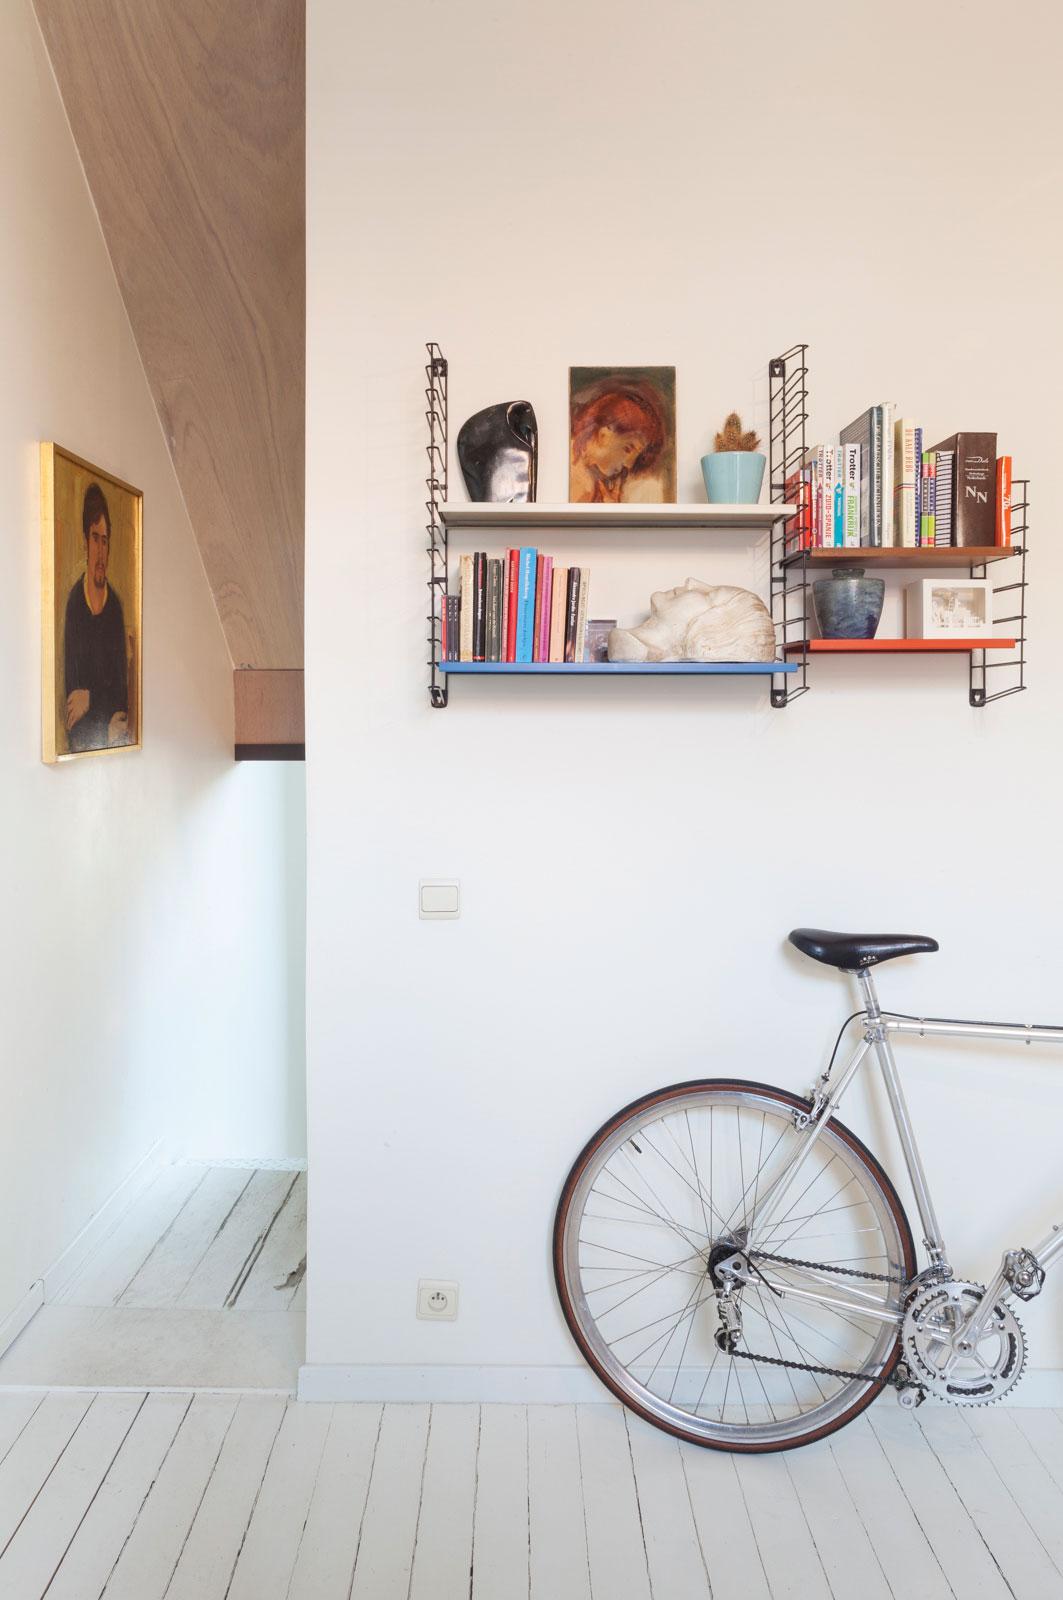 Tijl and Indra in Ghent, Belgium by Atelier Vens Vanbelle